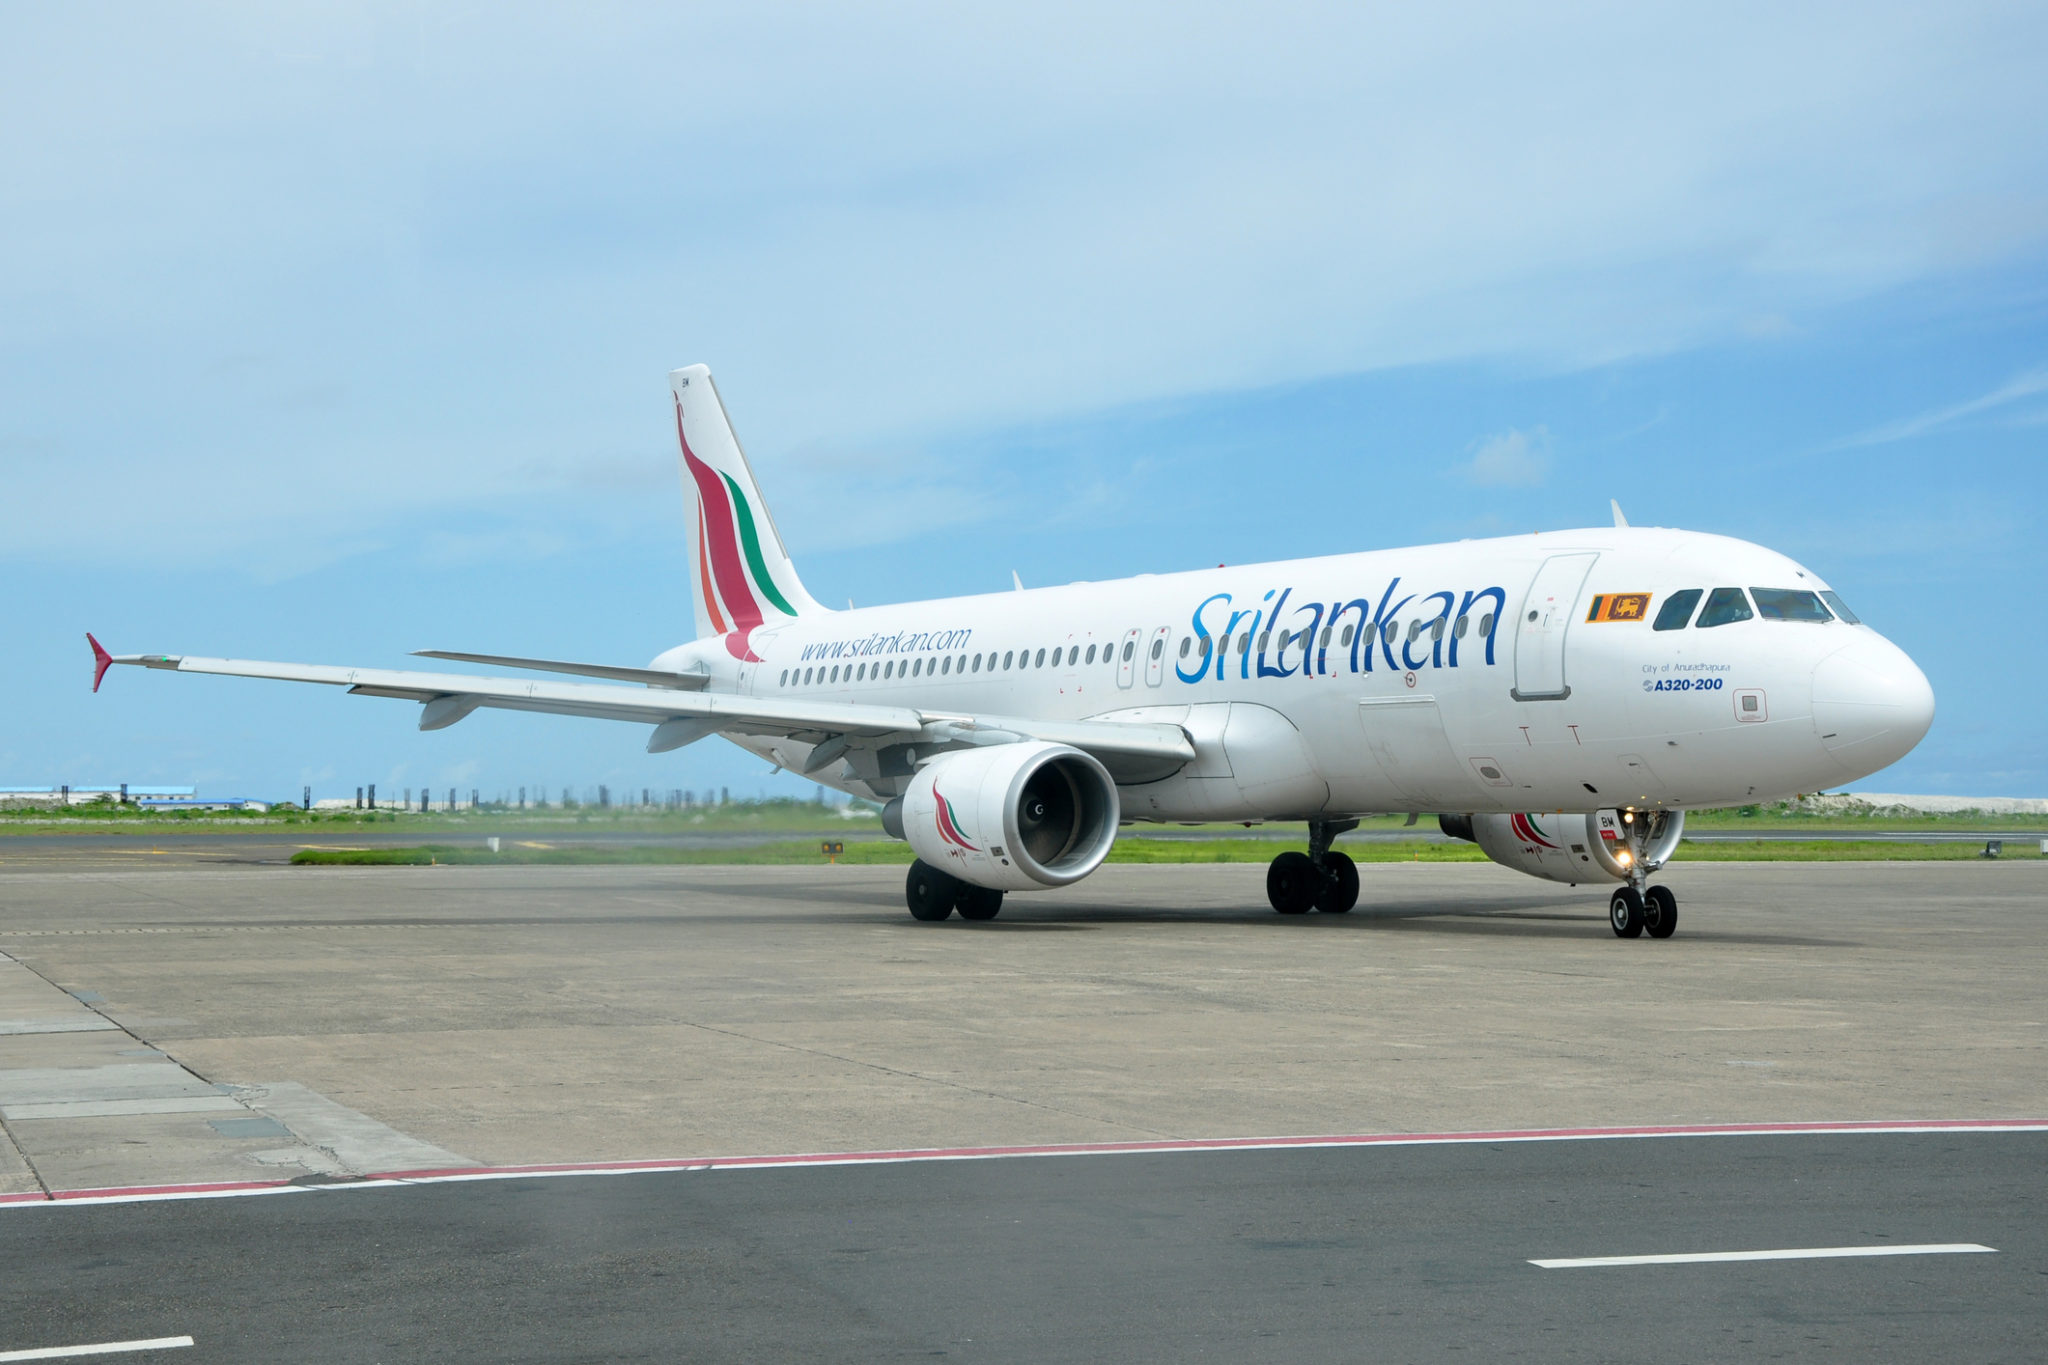 Letadlo Srilankan Airlines